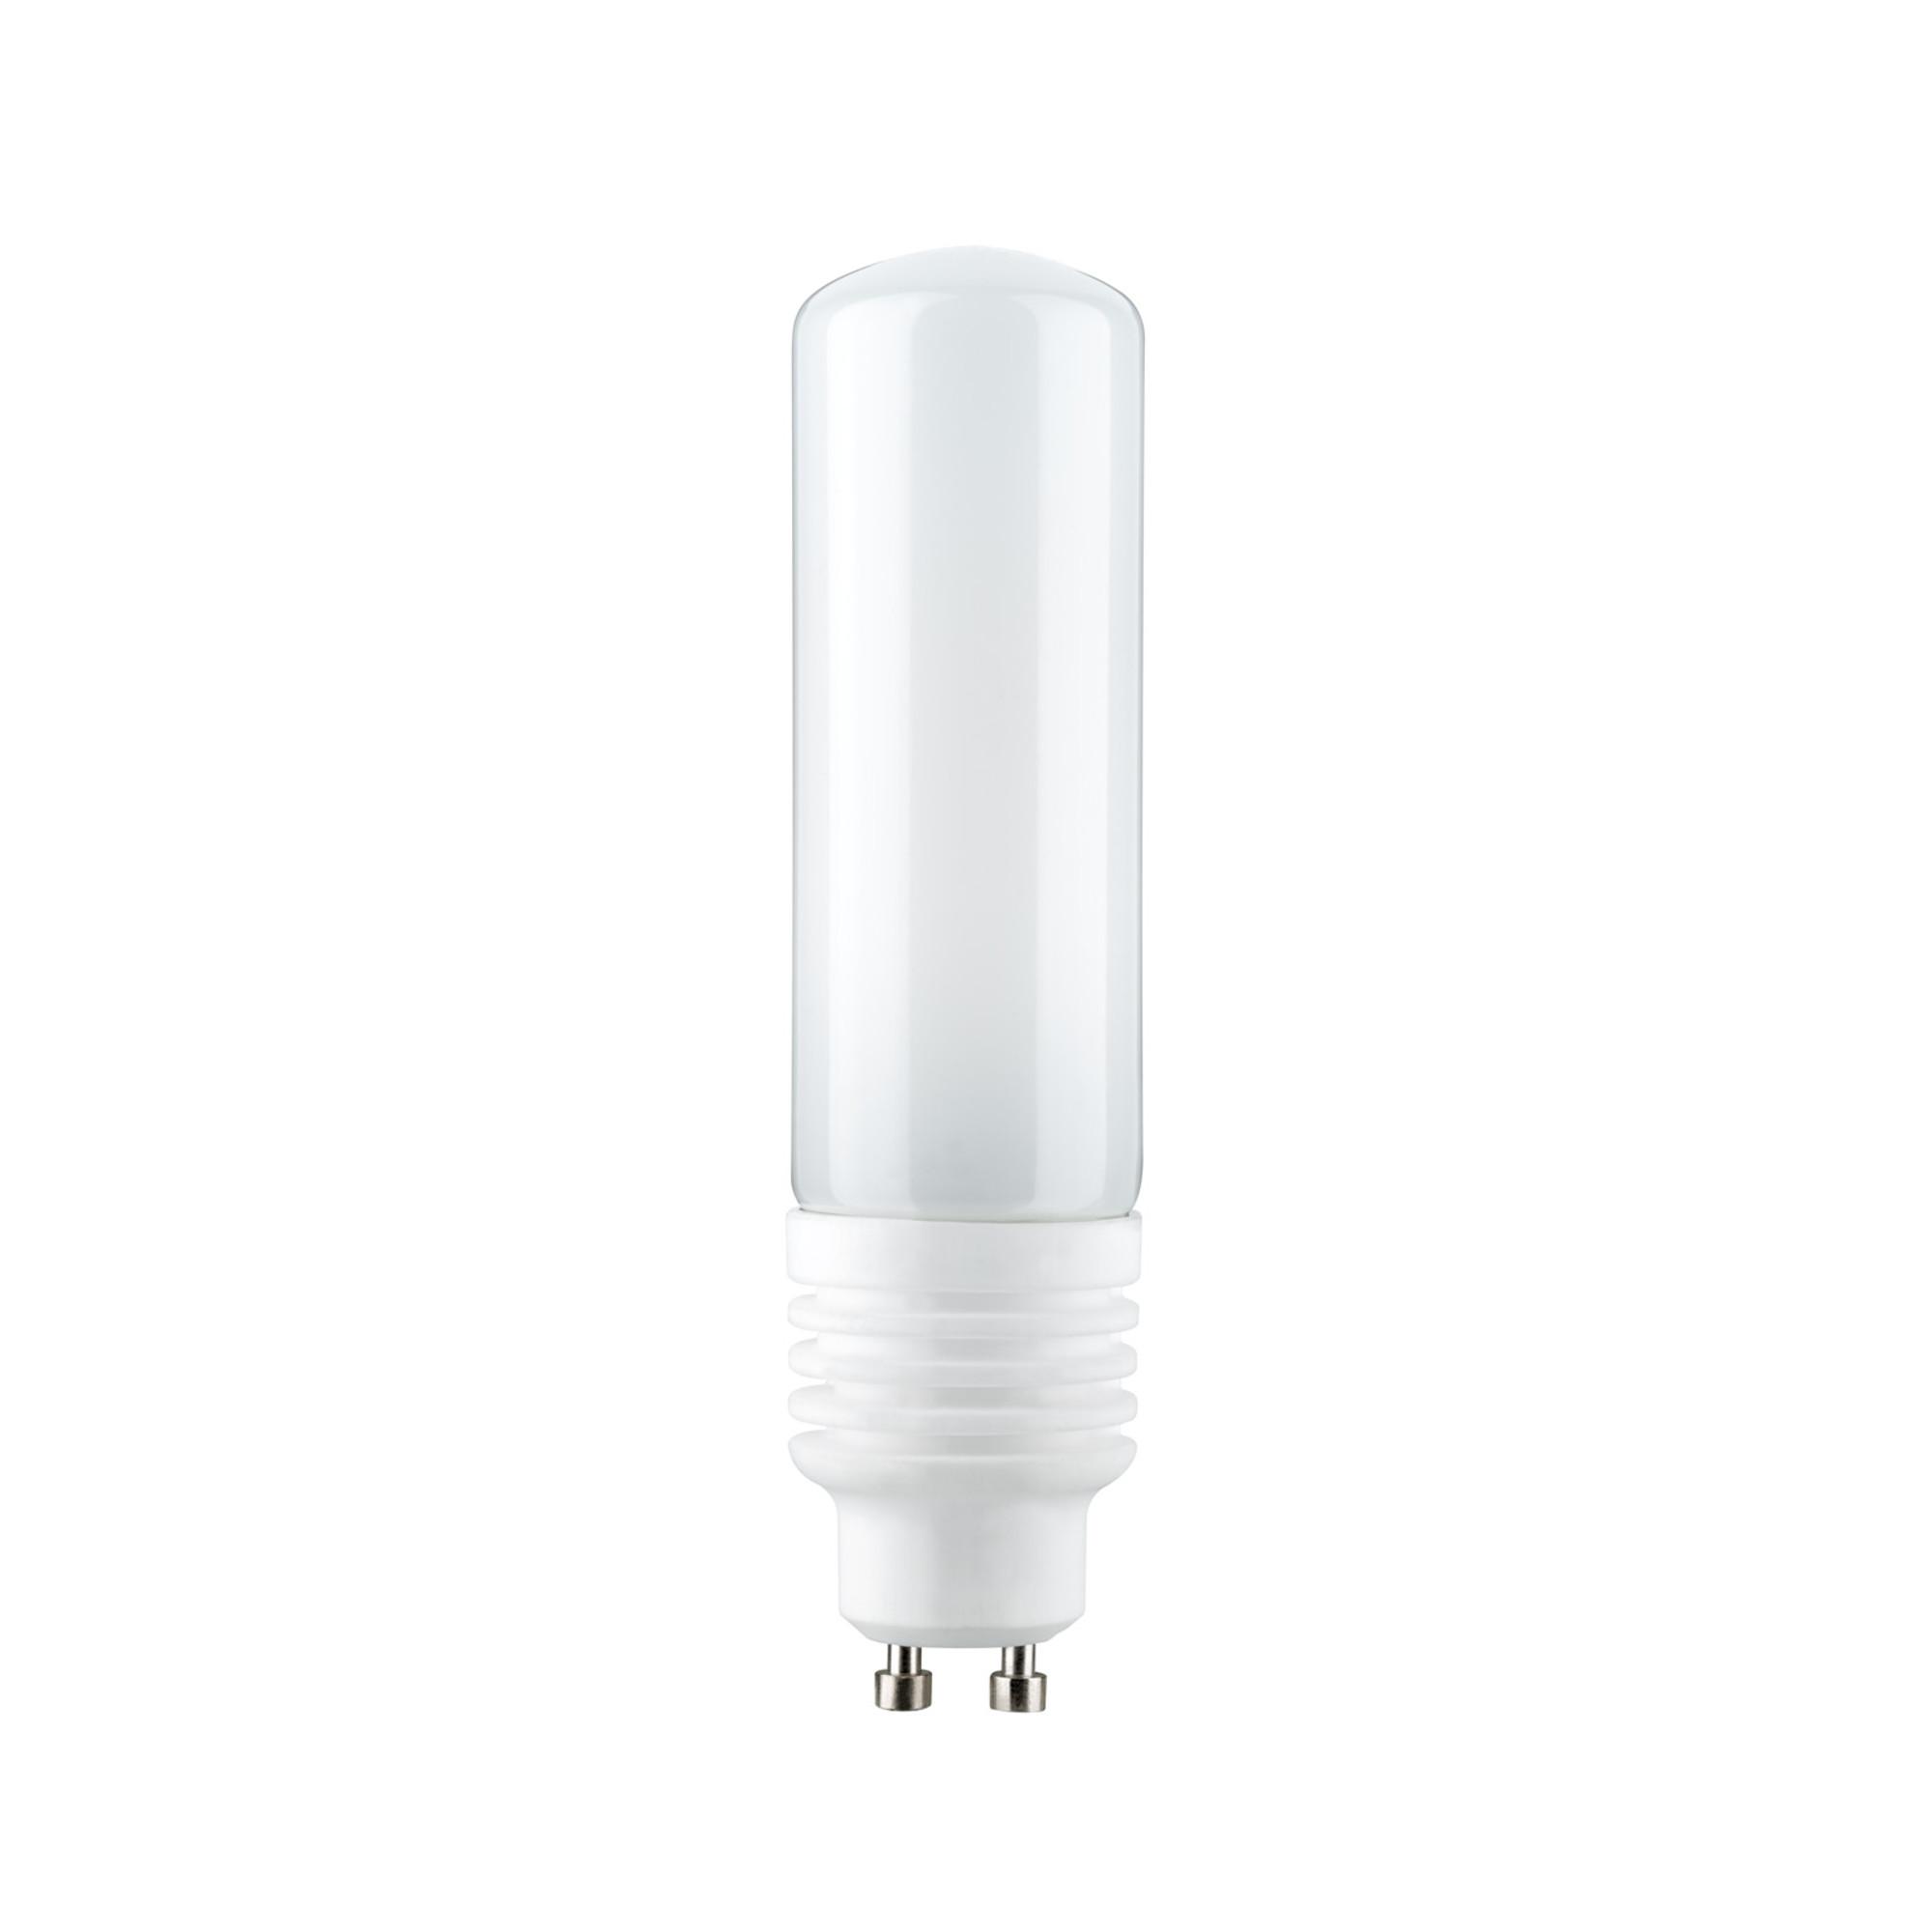 Лампа светодиодная Paulmann Deco Pipe Трубка 5Вт 560лм 2700K GU10 230В Сатин 28418.